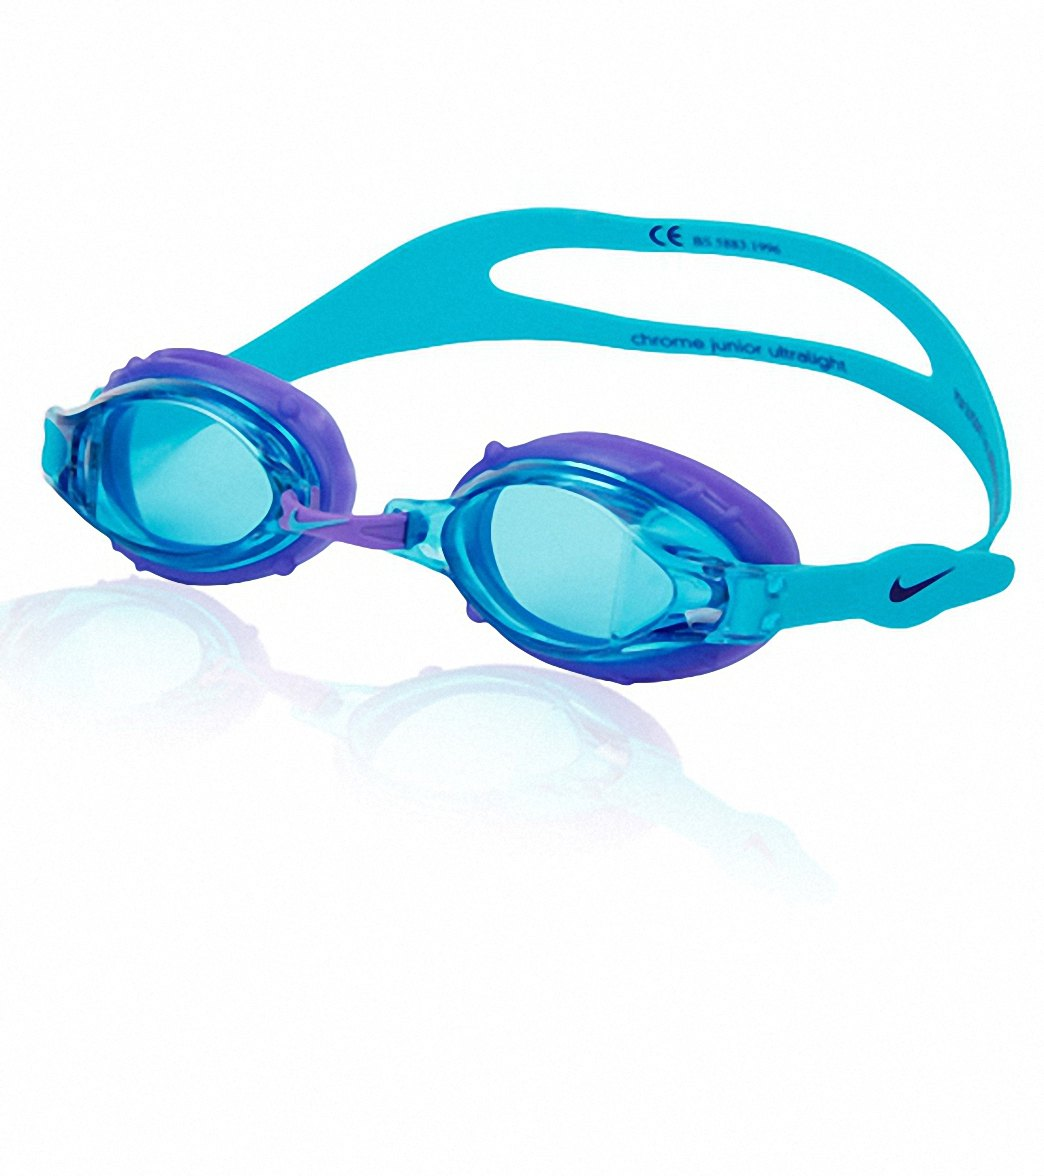 44732f092470 Nike Swim Chrome Jr Goggles at SwimOutlet.com